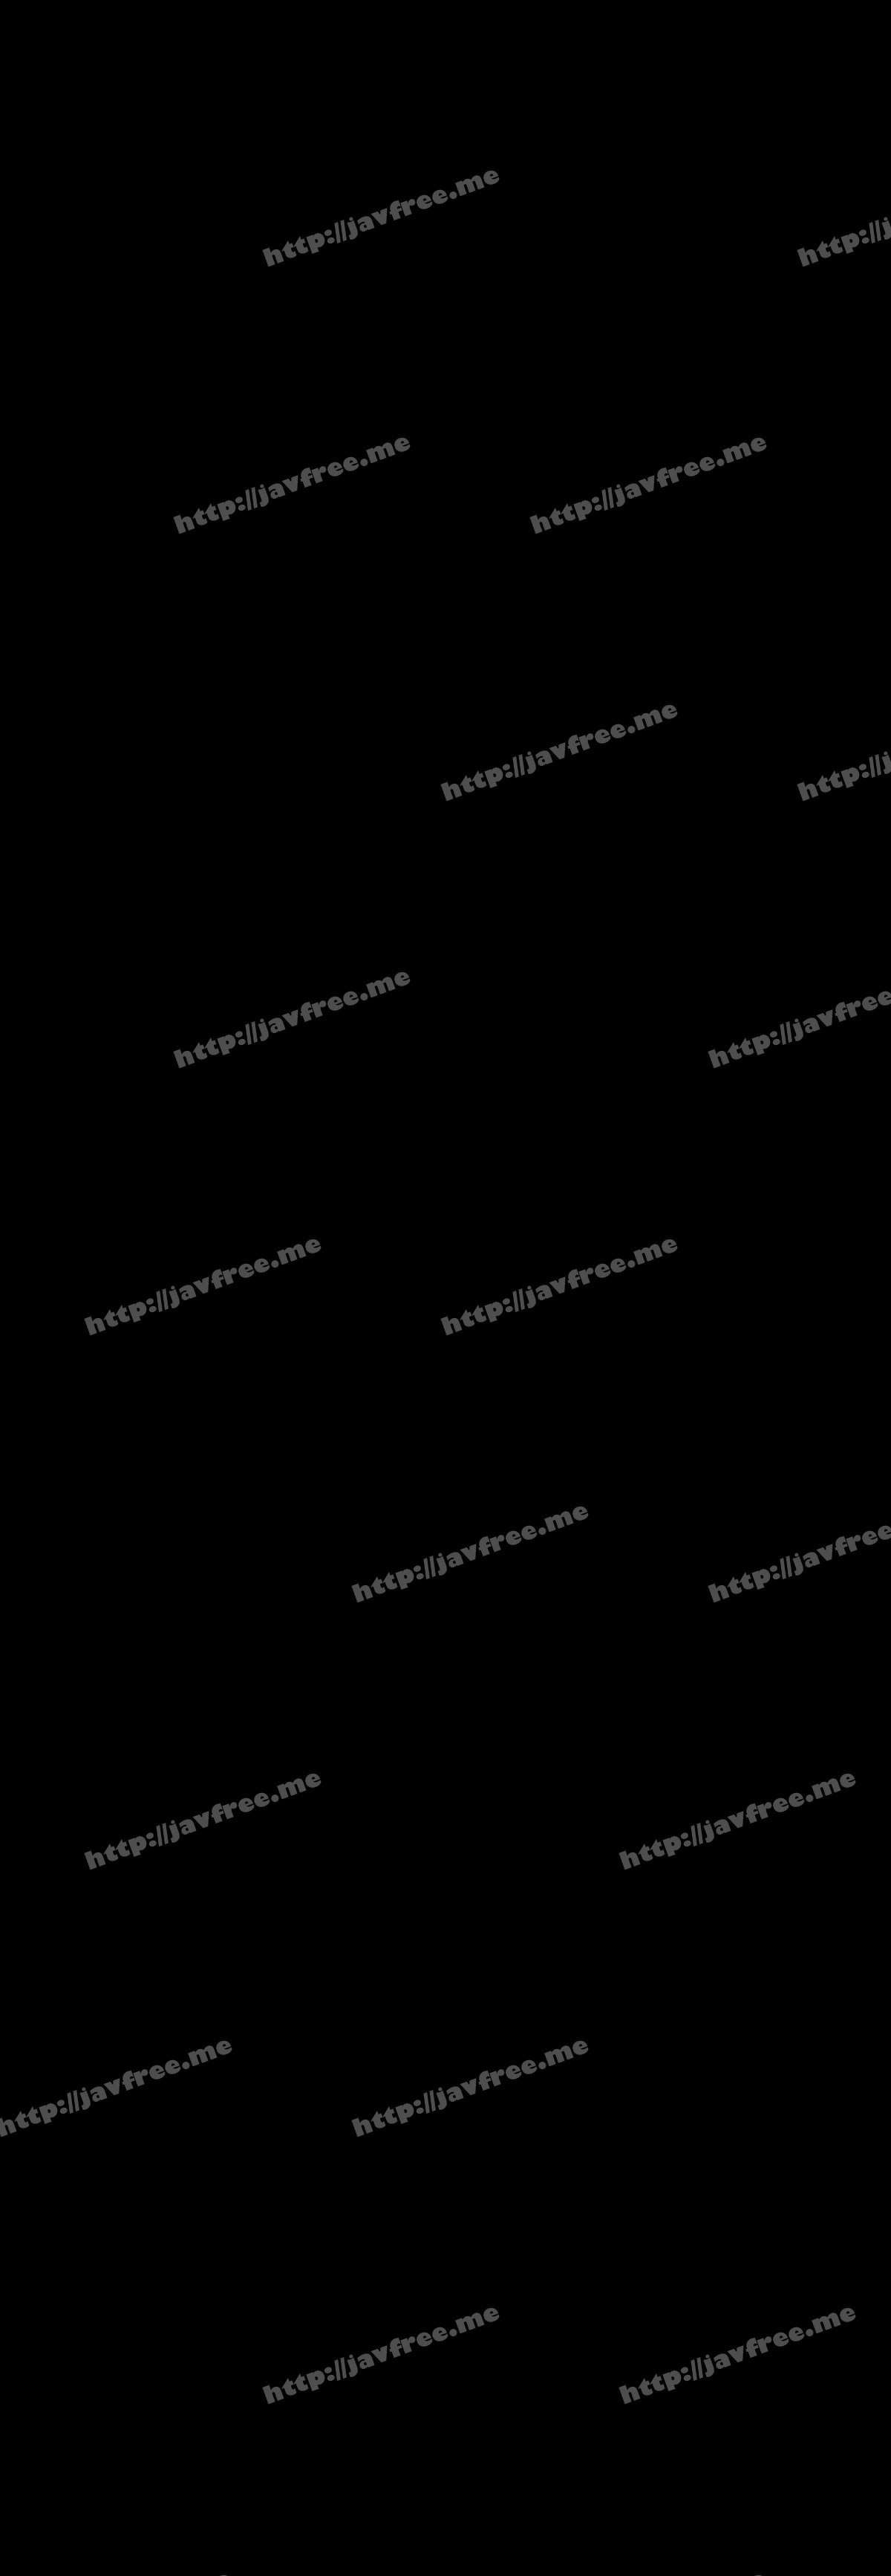 [HD][ONEZ-229] 10発射精をお約束!即尺即ハメOK!スケスケ制服美少女在籍!ヌルテカオイル風俗 早美れむ Vol.001